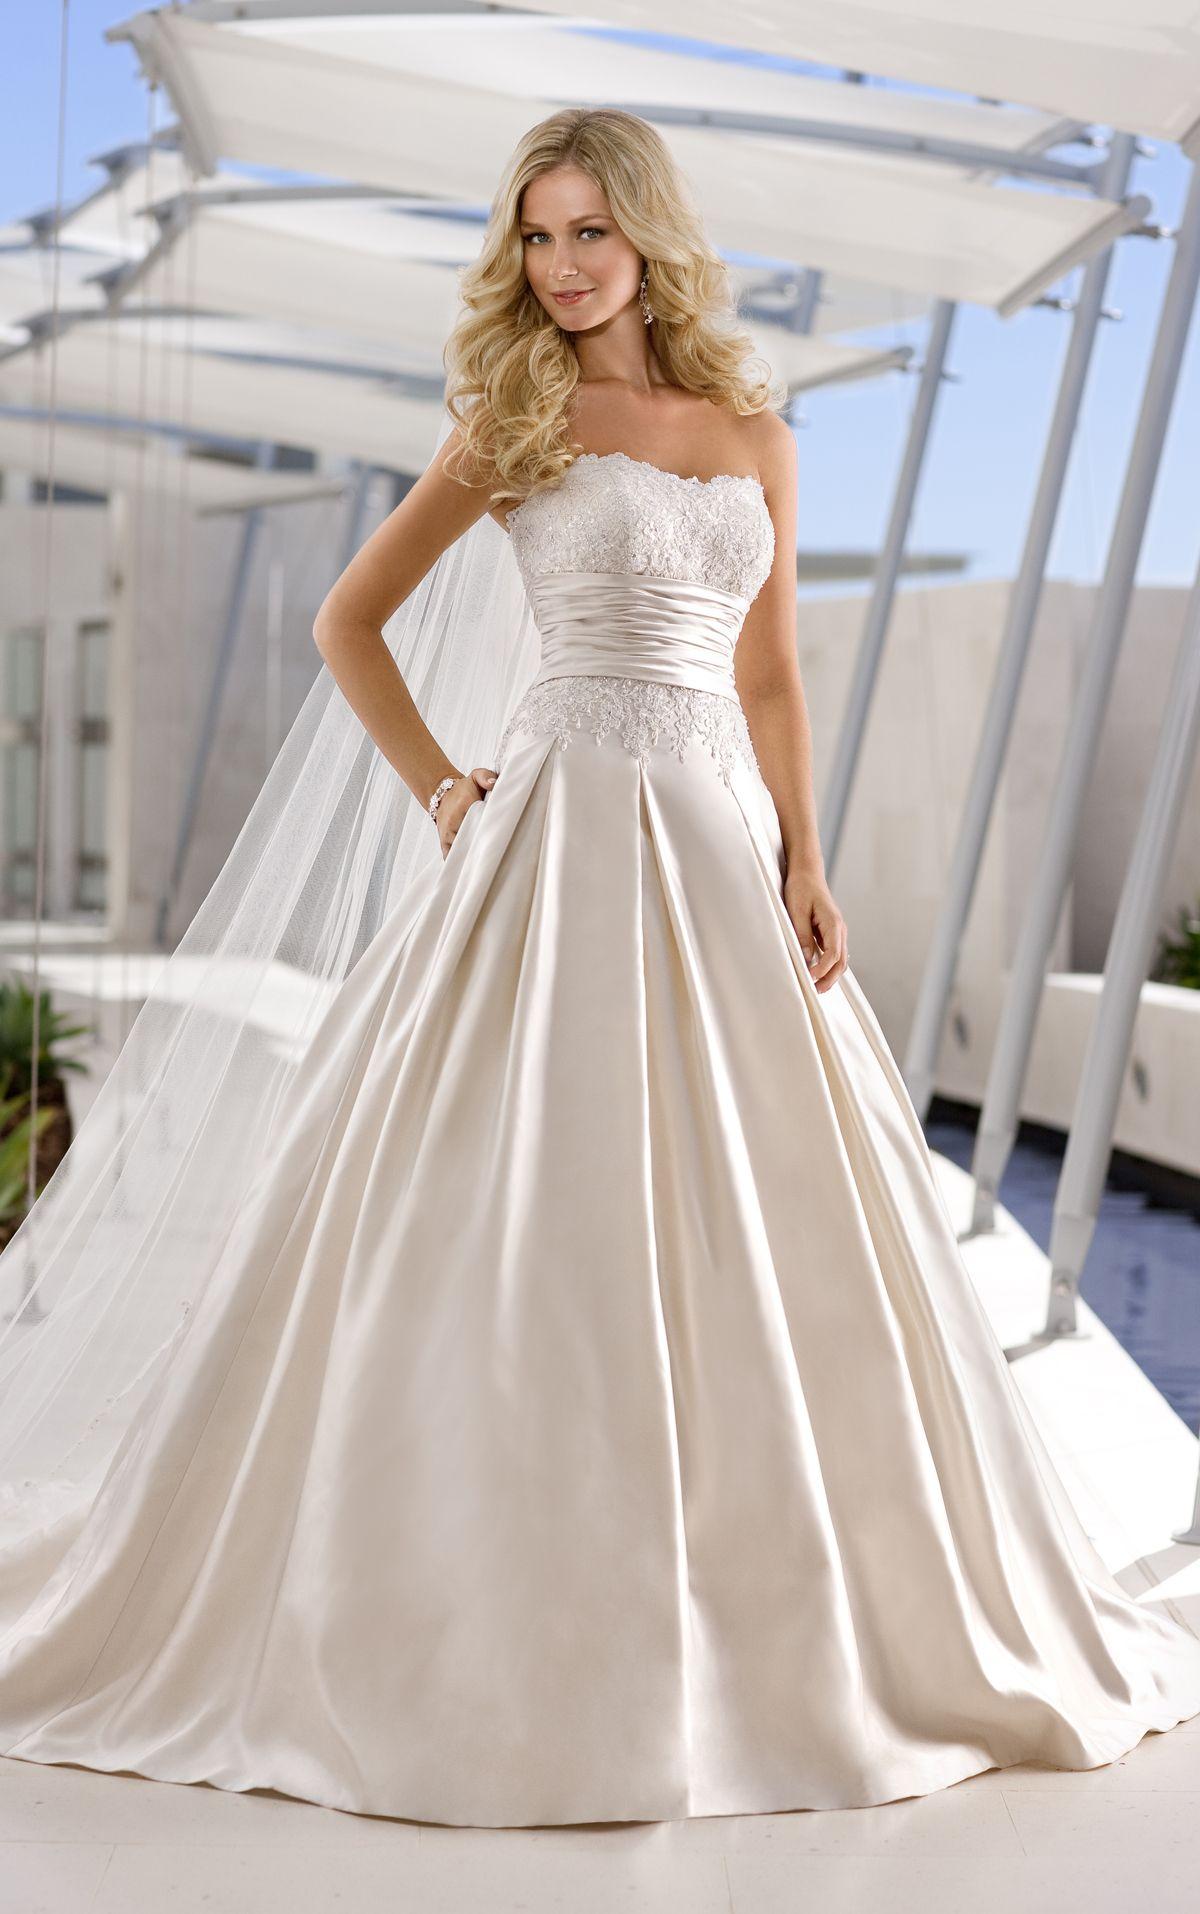 Mod wedding dress  Sexy and Extravagant Stella York Wedding Dresses   Savvy